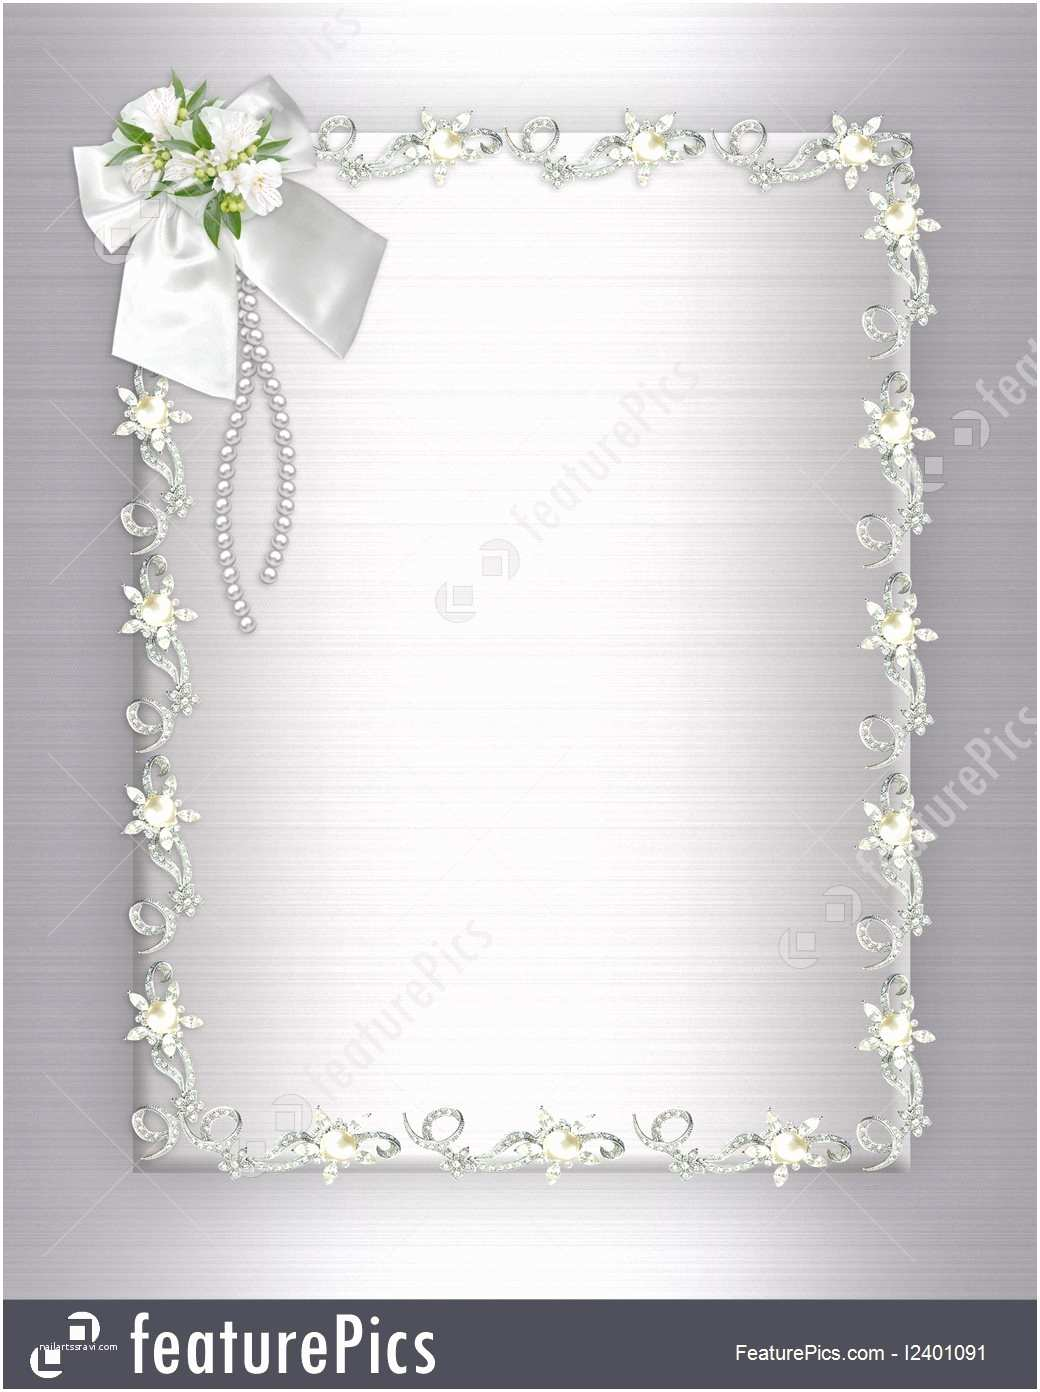 Wedding Invitation Pictures Background Wedding Invitation Backgrounds Yourweek 8a507beca25e